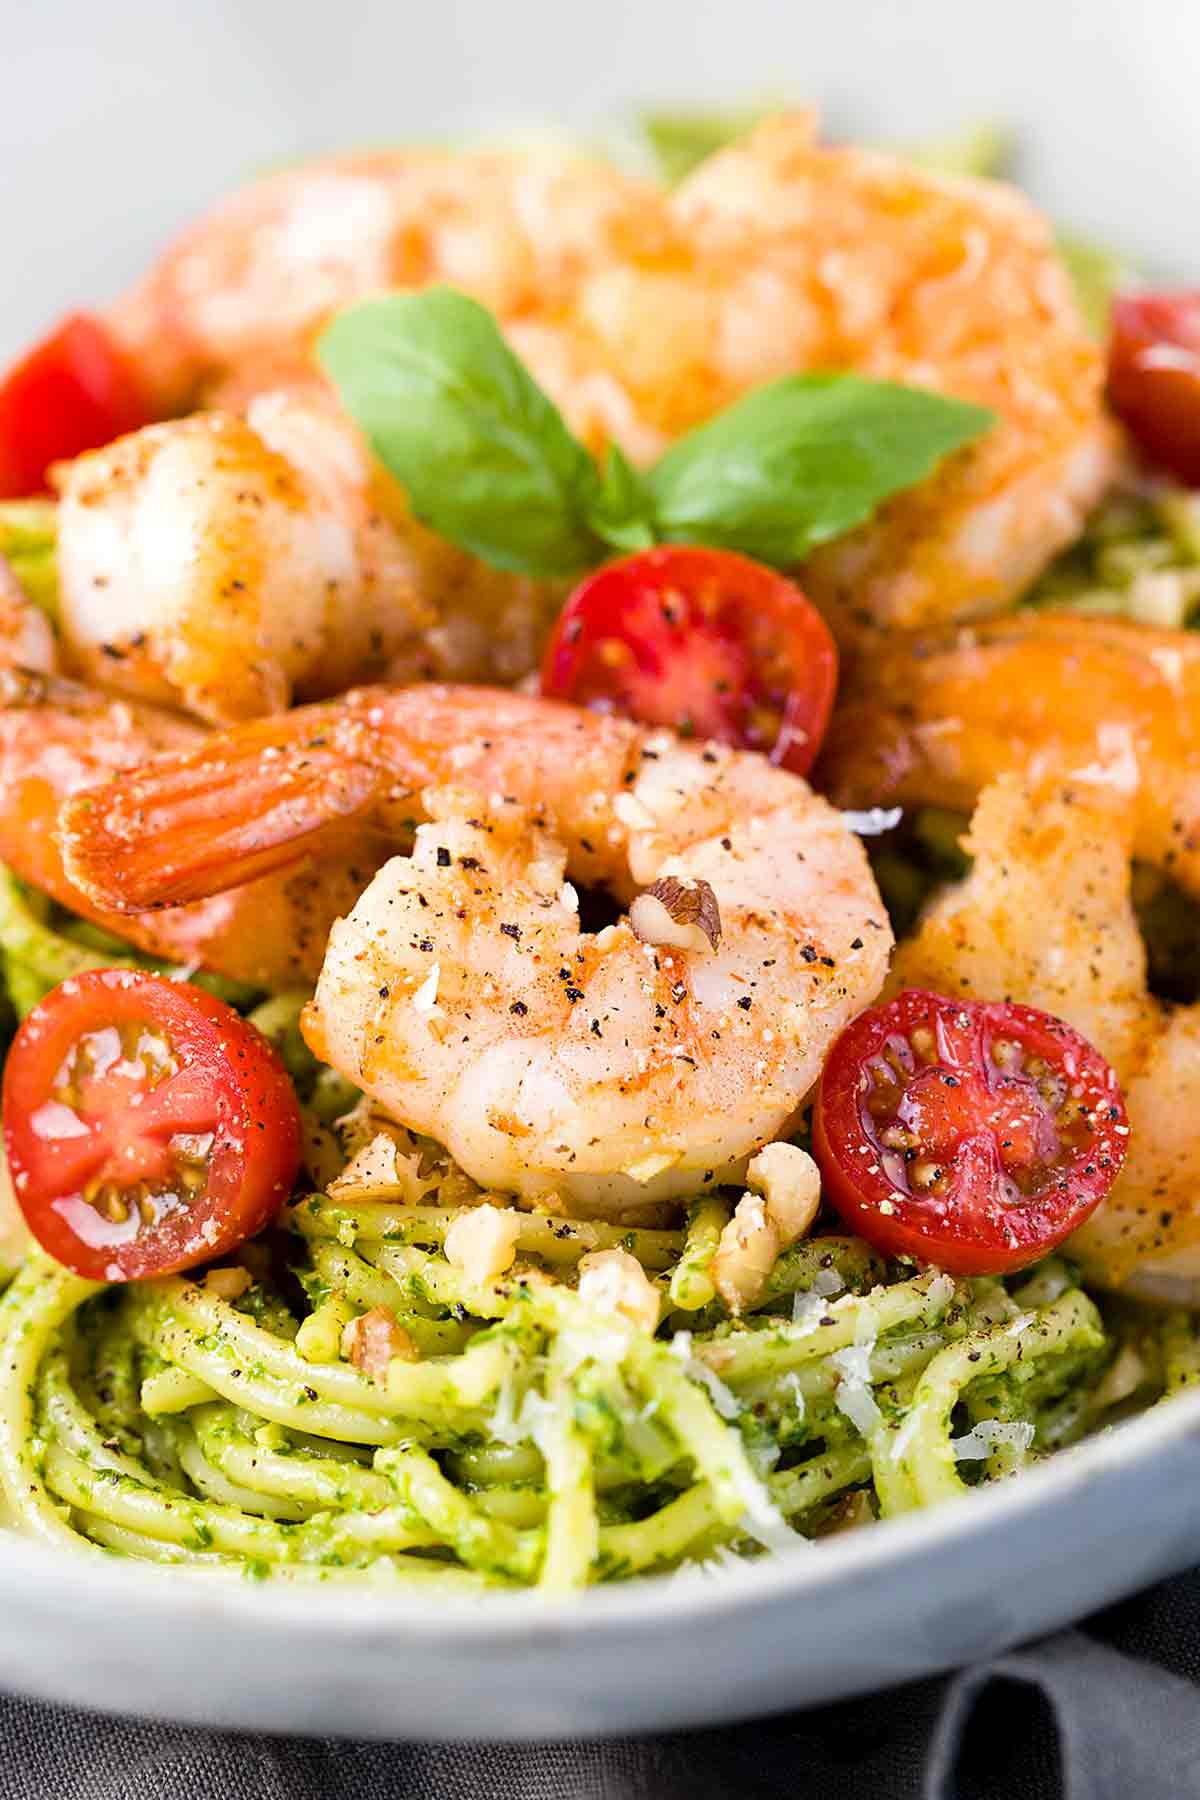 White bowl with pesto shrimp pasta and cherry tomatoes